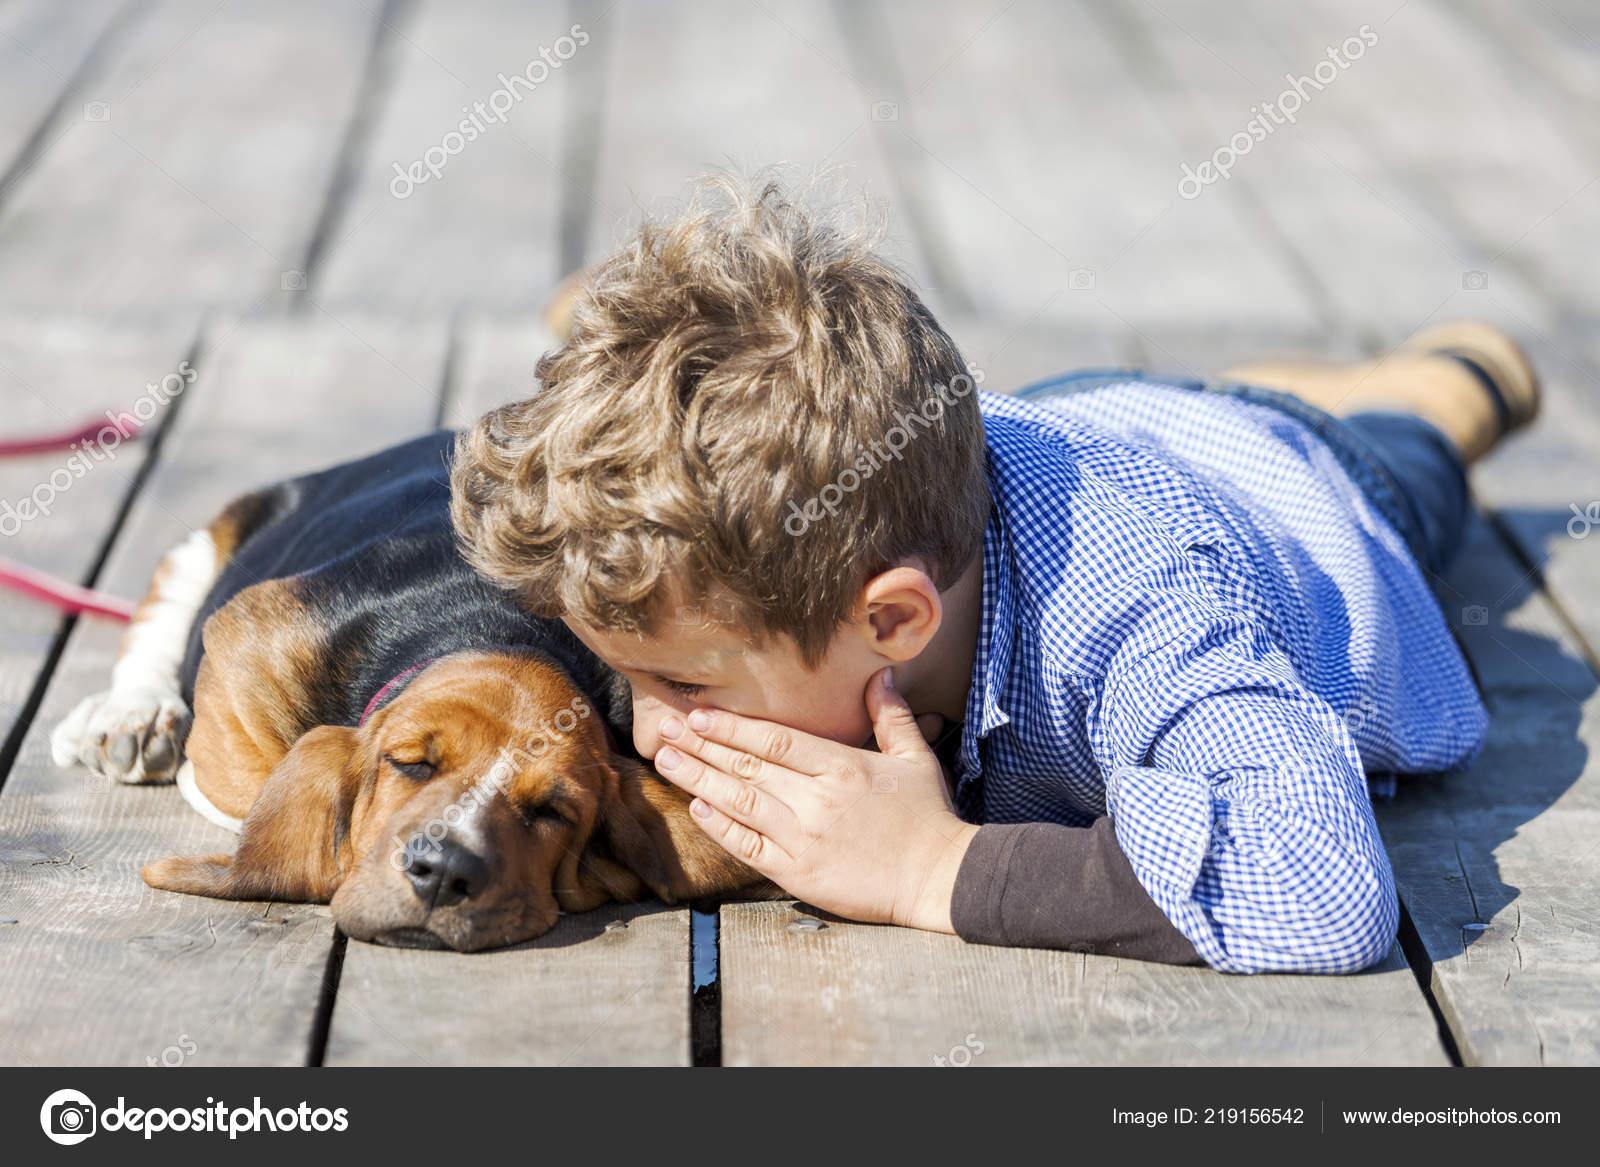 Little Cute Boy Lying River His Puppy Enjoy Together